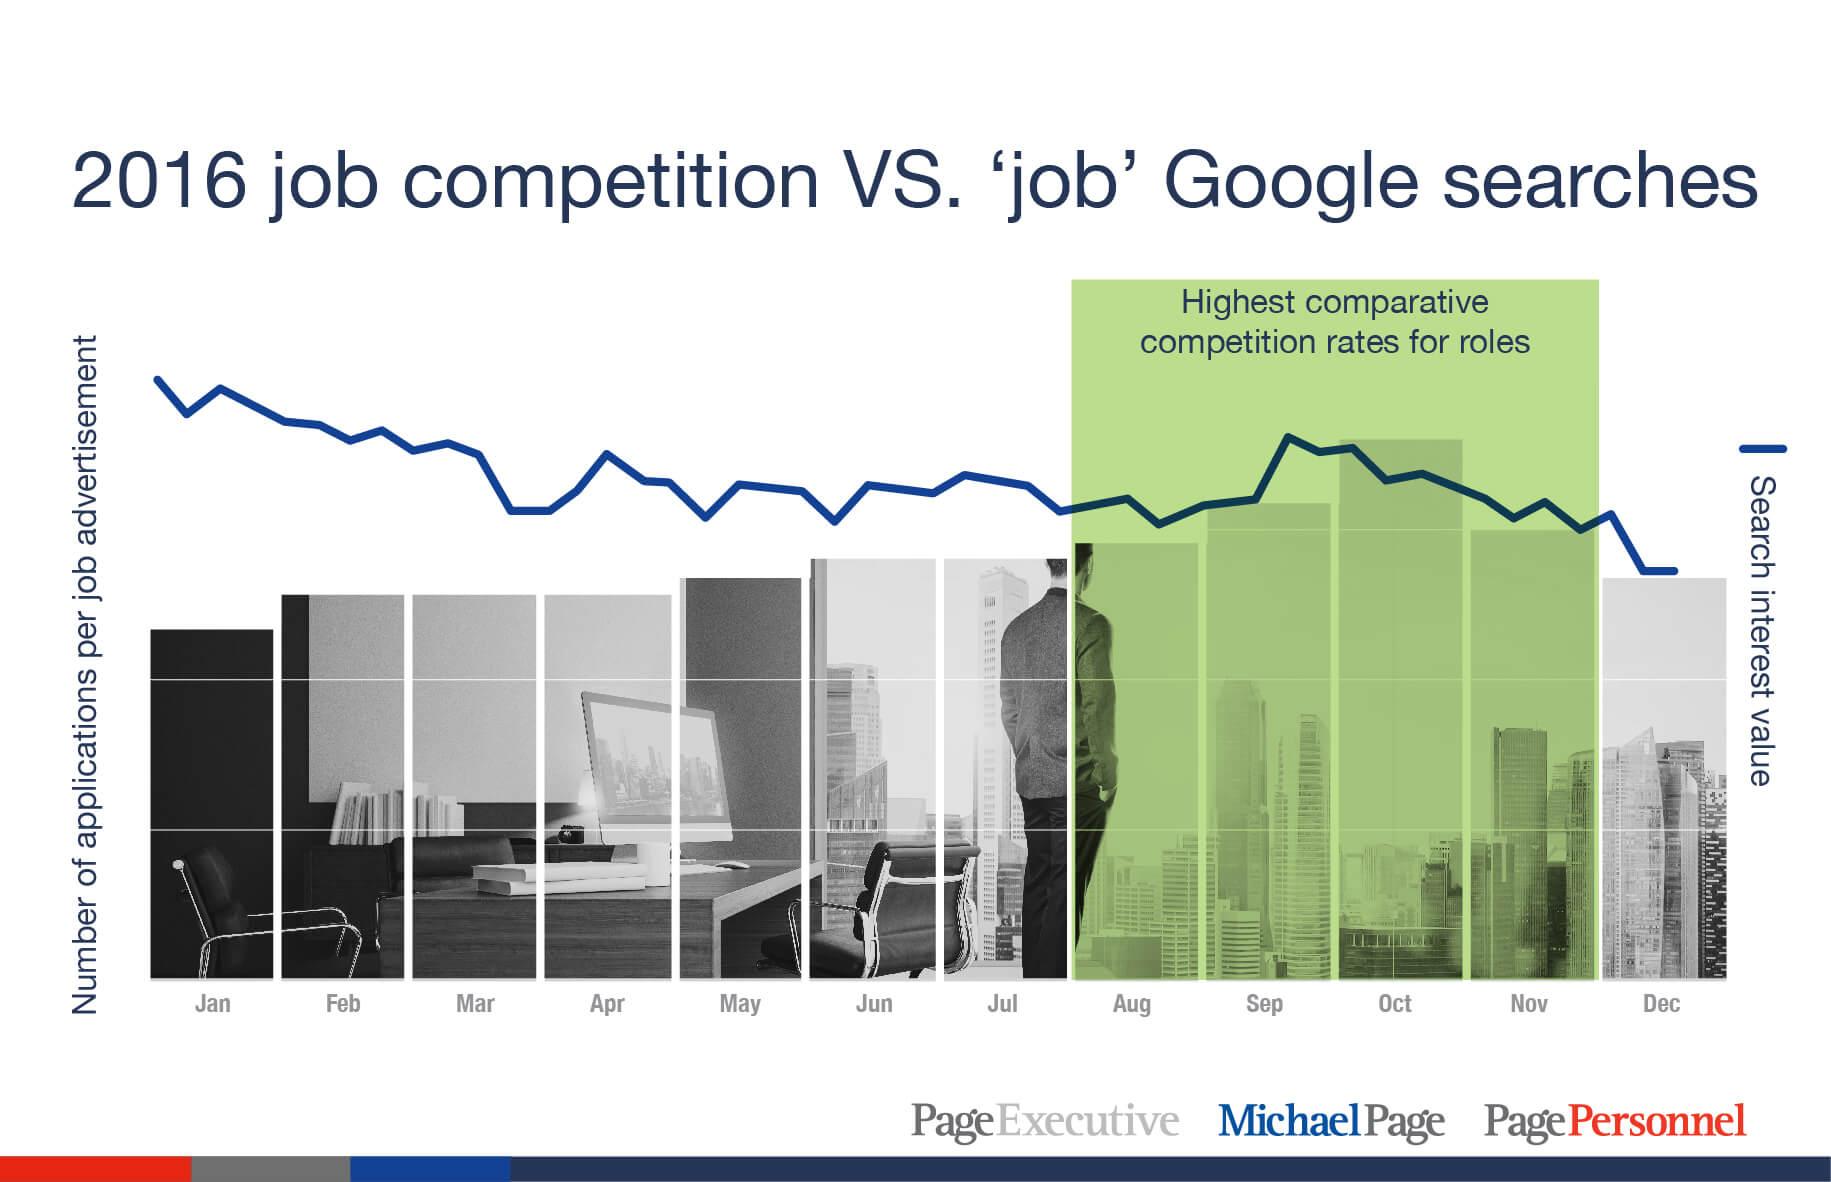 2016 job competition VS. 'job' Google searches